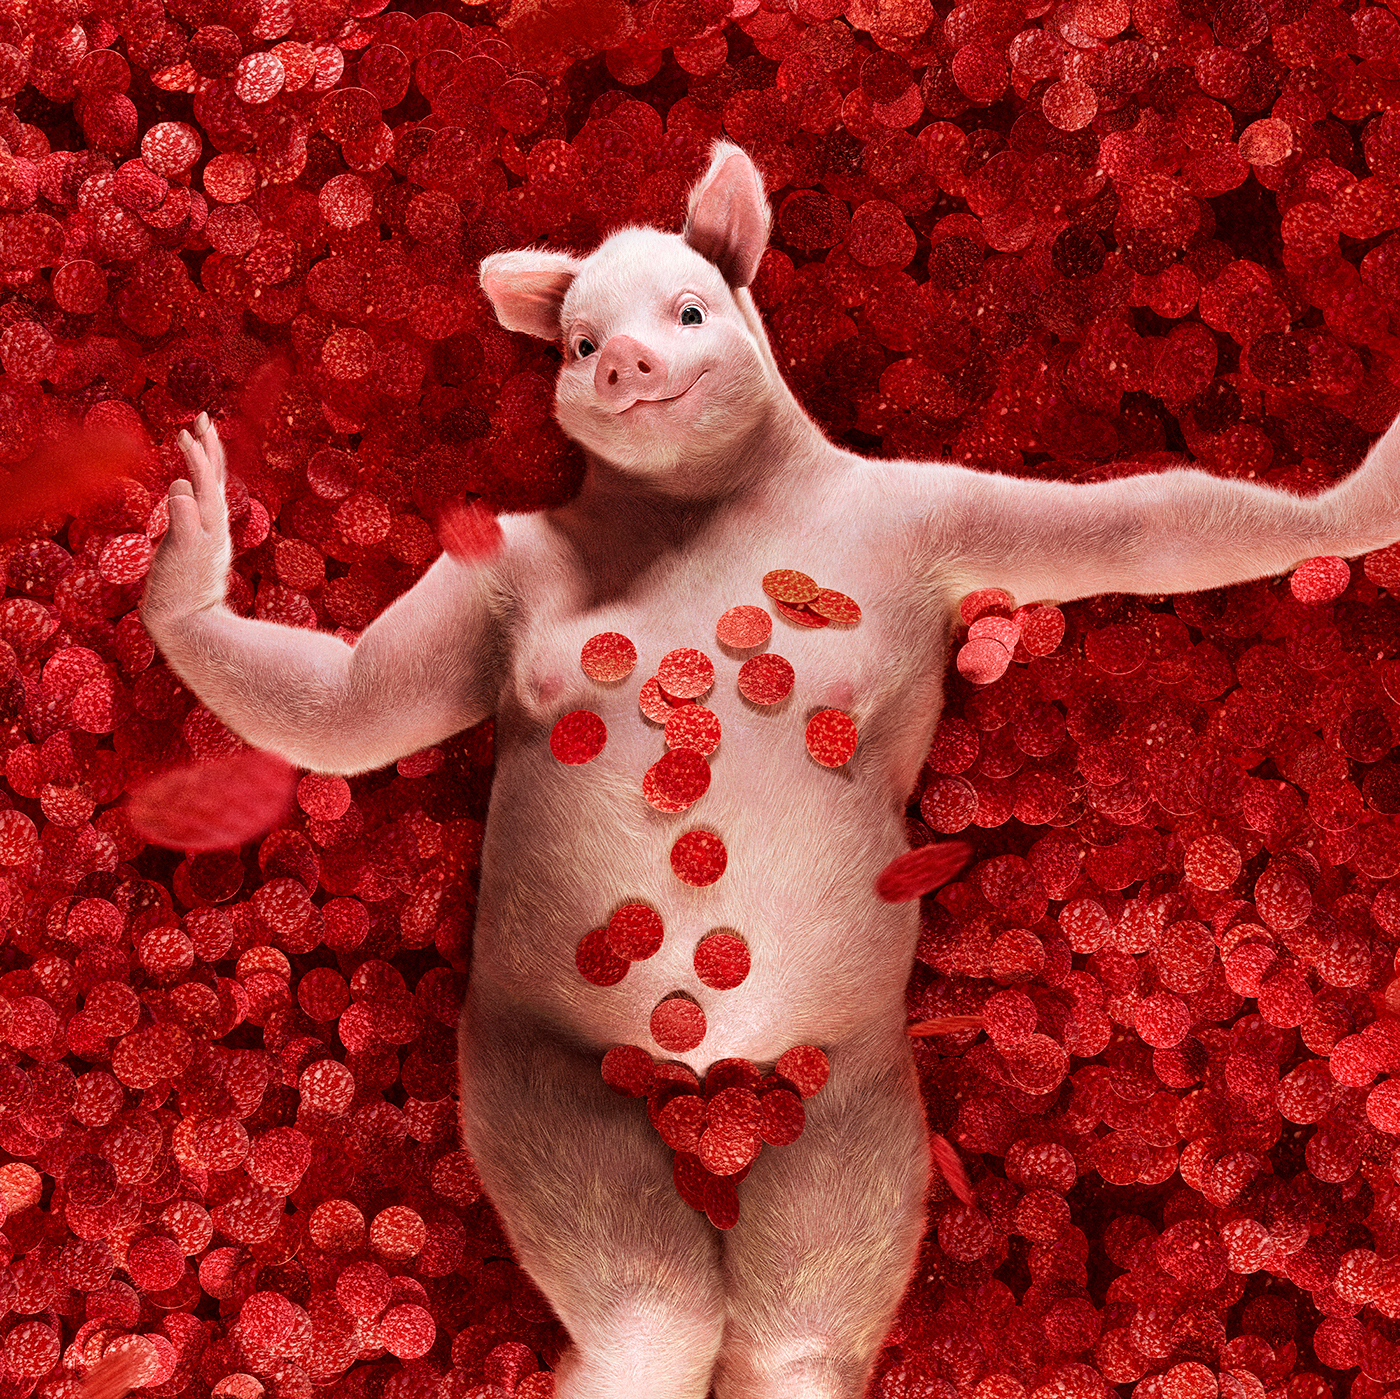 Swine Dreams / работа Cristian Girotto